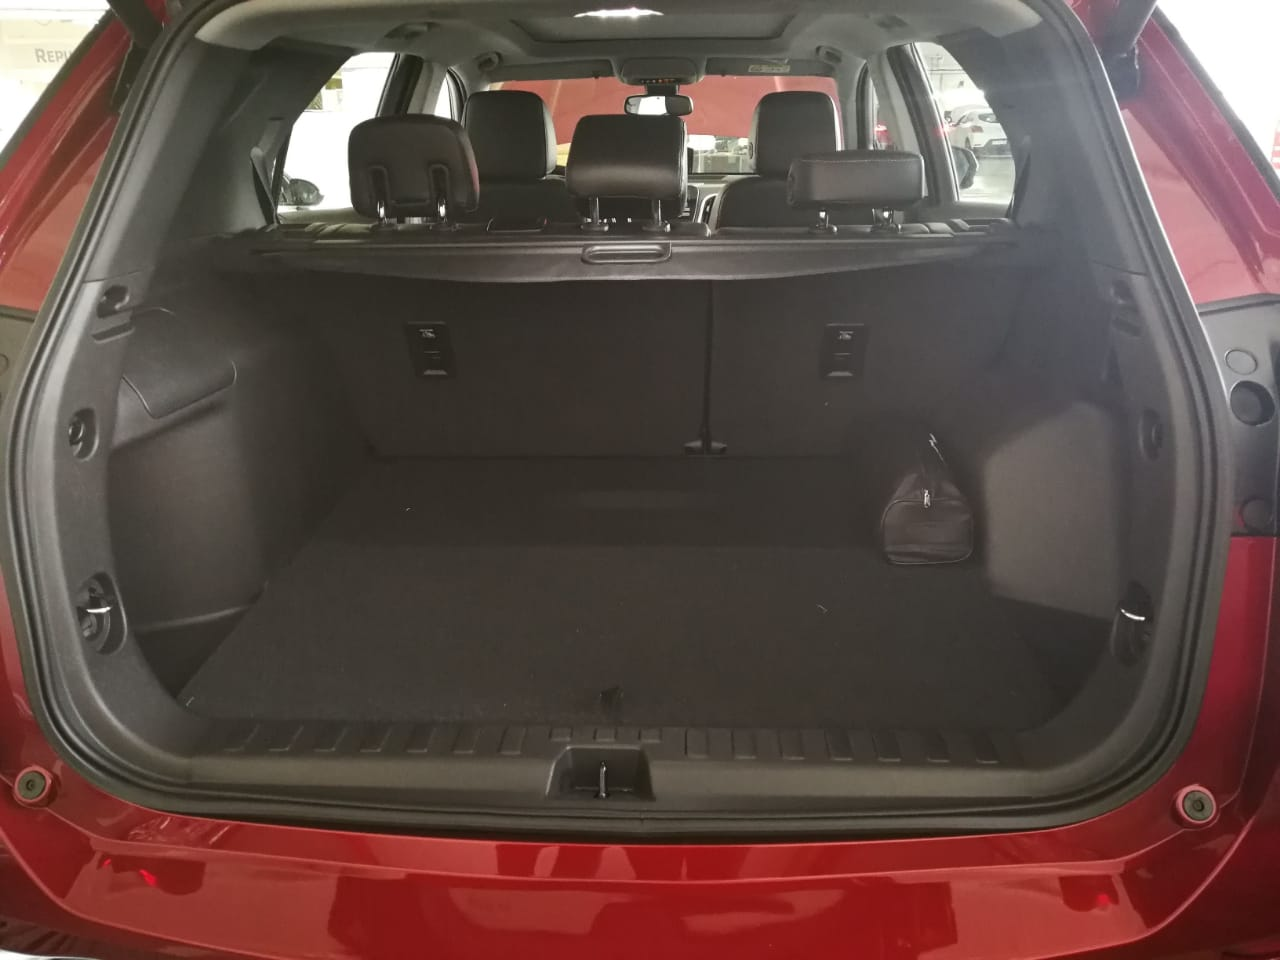 2020 CHEVROLET Equinox Premier AWD 1,5